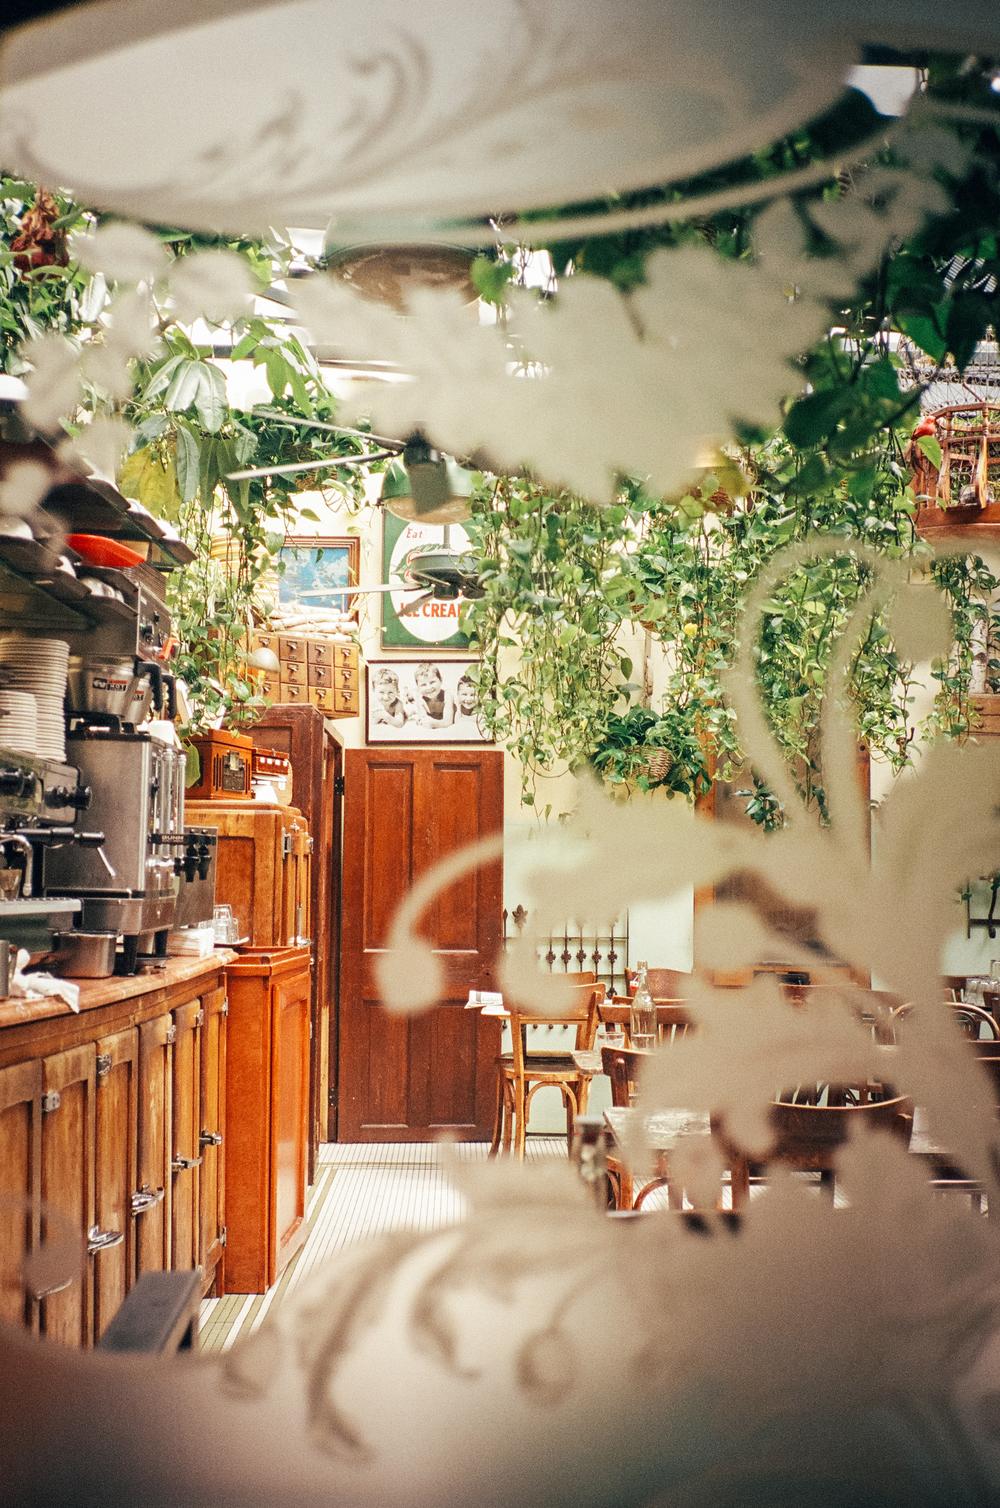 FILM_carlyfoulkes-00300026.jpg